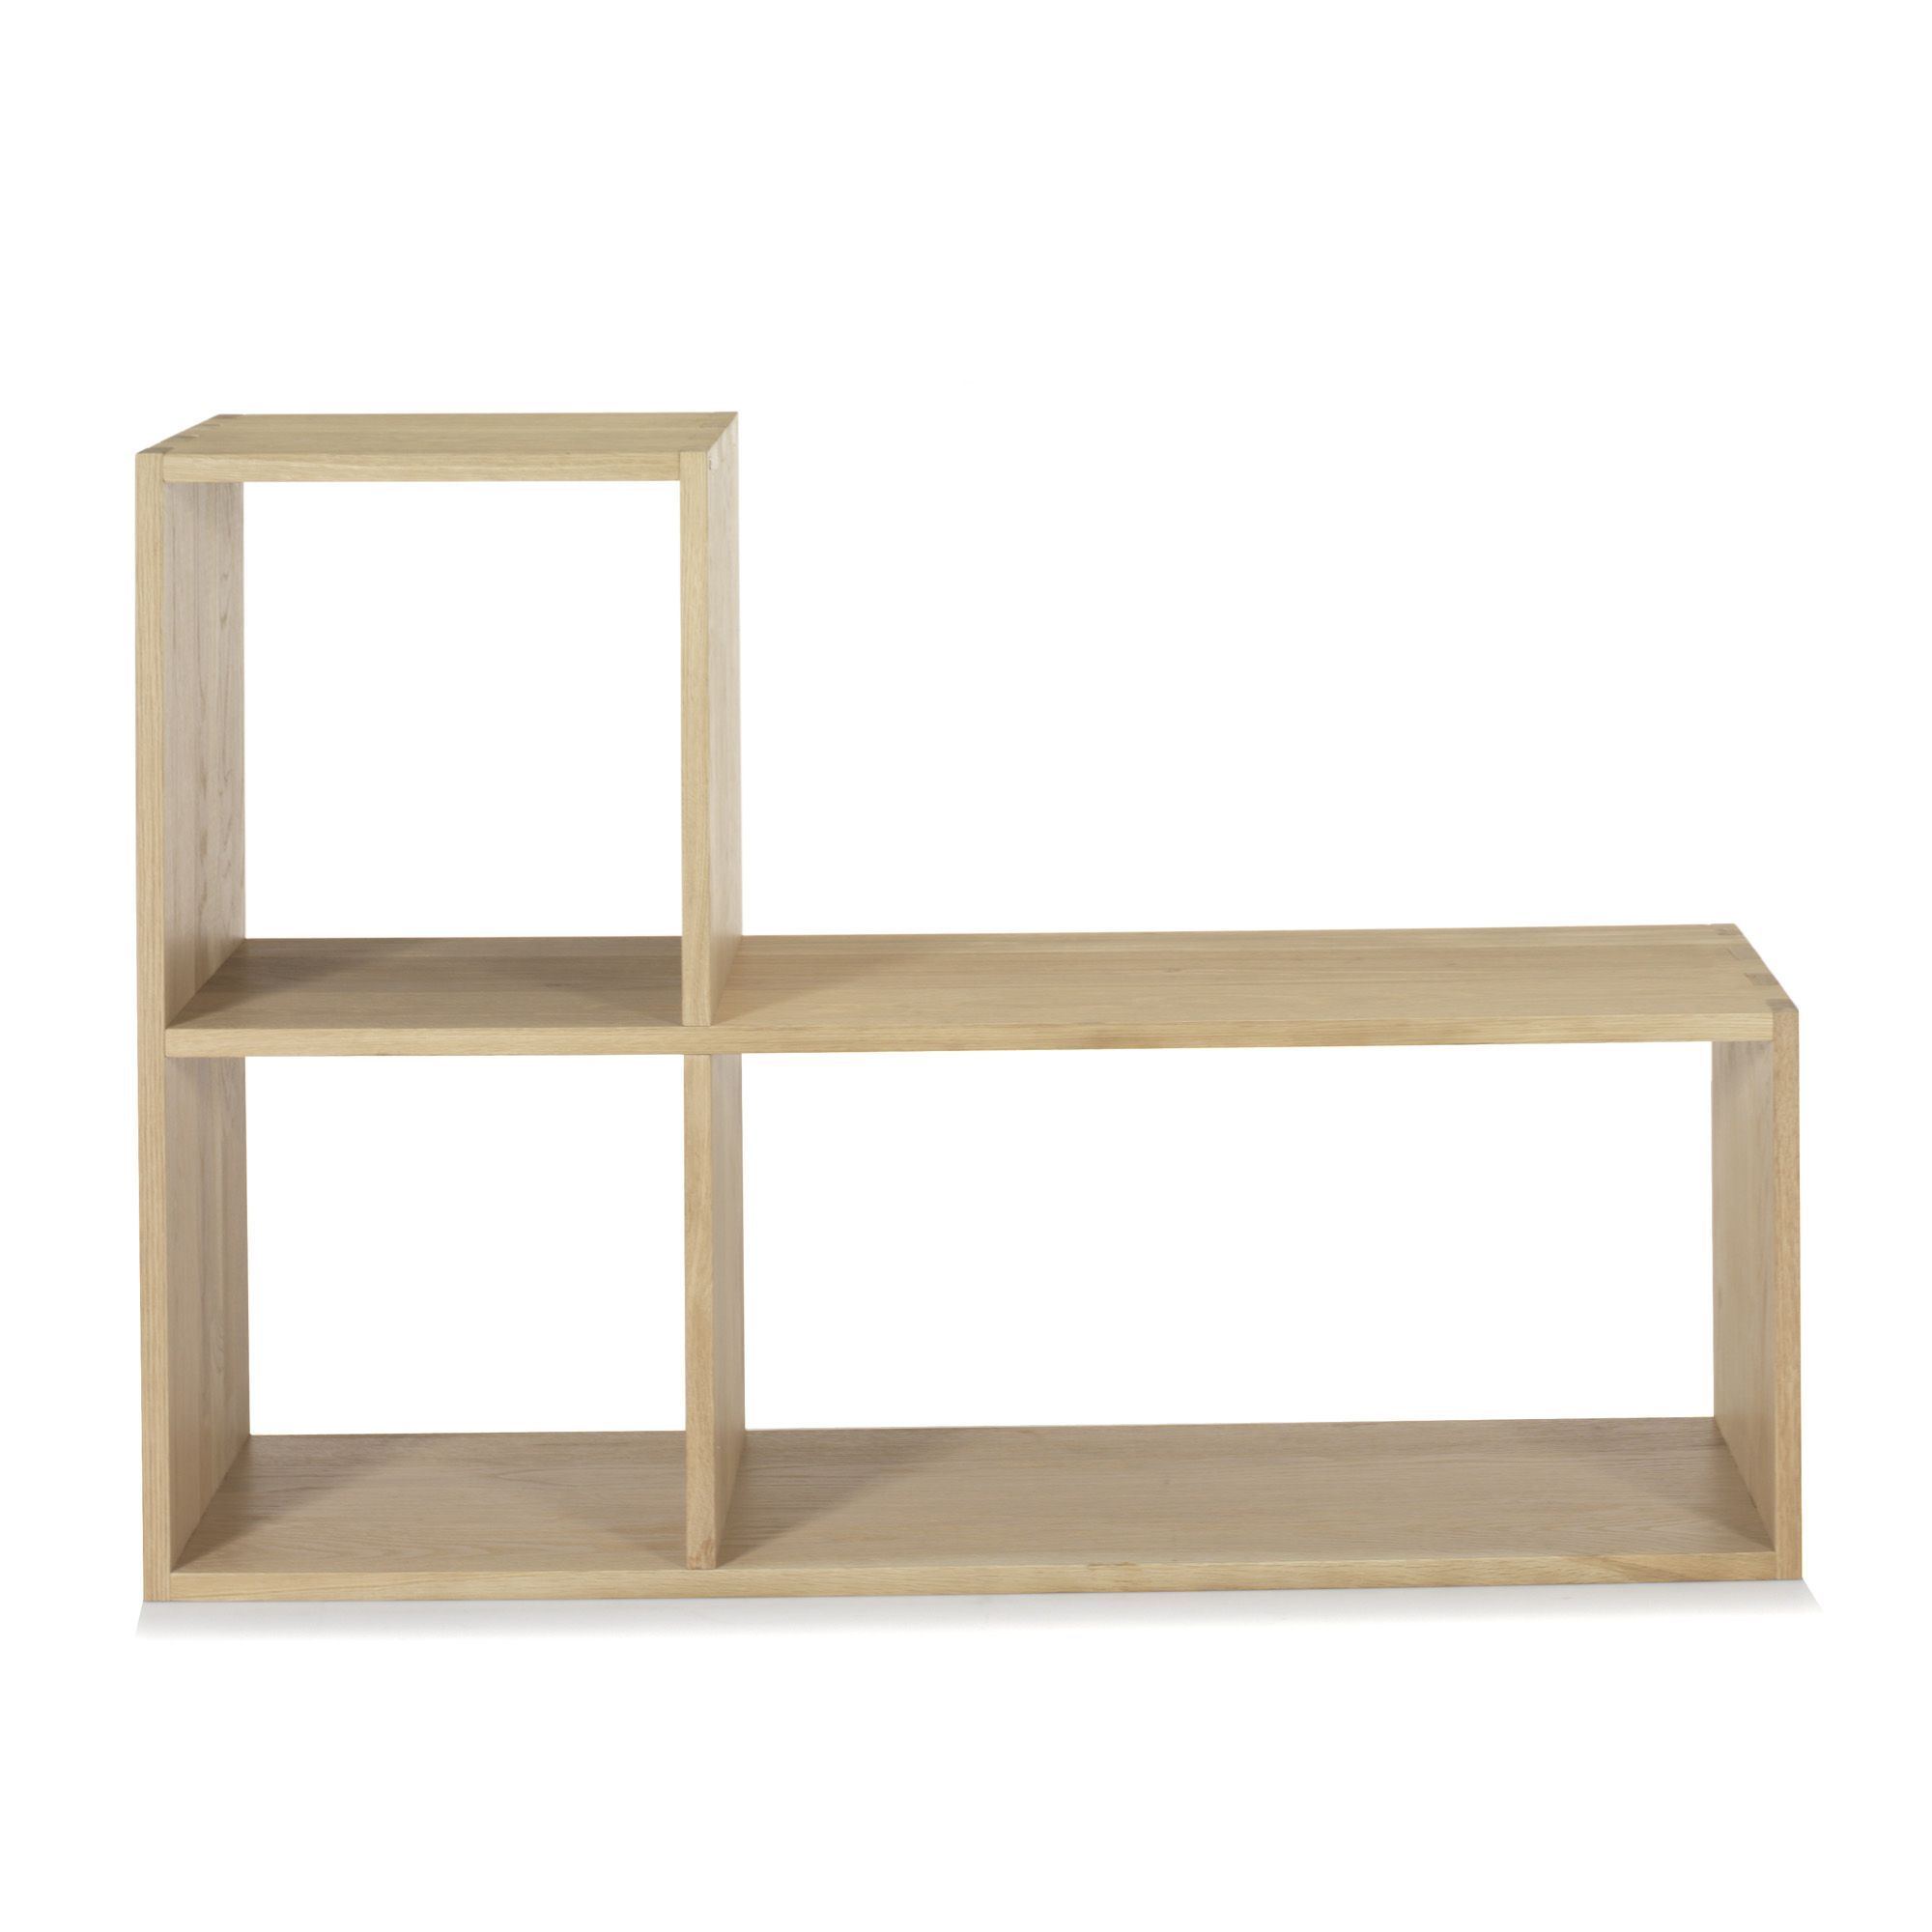 tassia tag re en l en ch ne tag res de salon chene massif et alin a. Black Bedroom Furniture Sets. Home Design Ideas